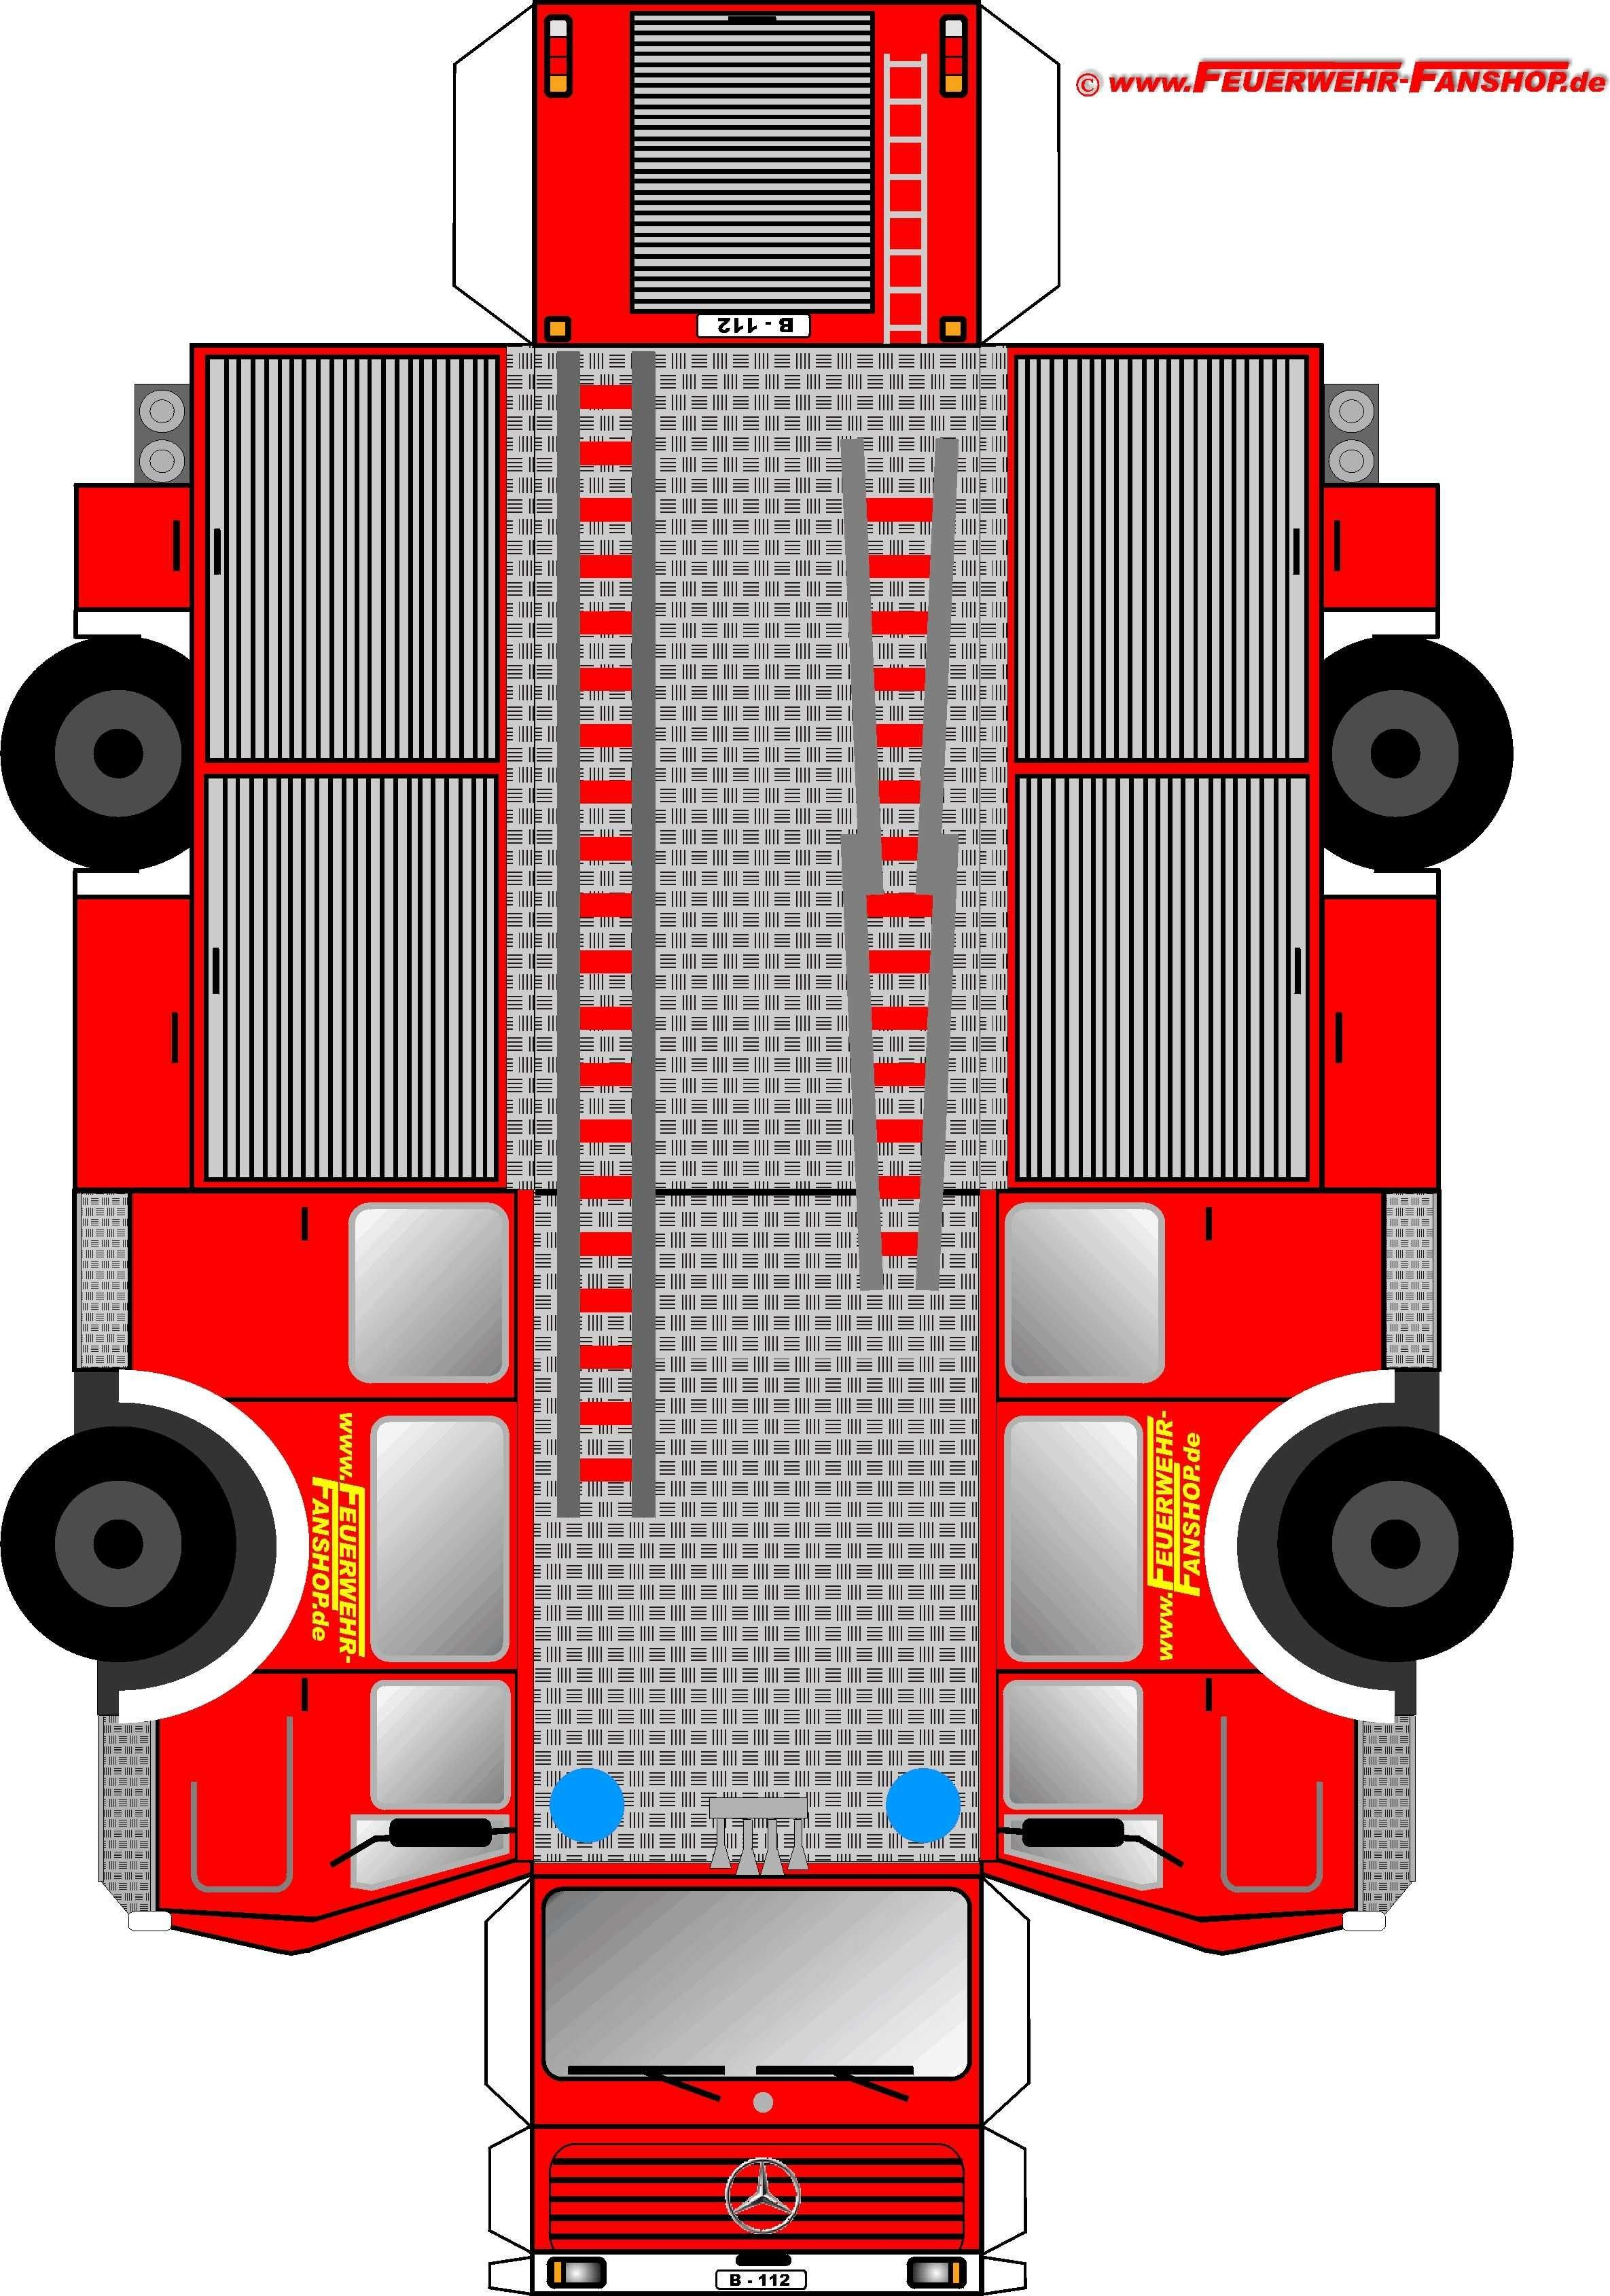 Mini Cooper Papercraft Feuerwehrauto Basteln Papr Pinterest